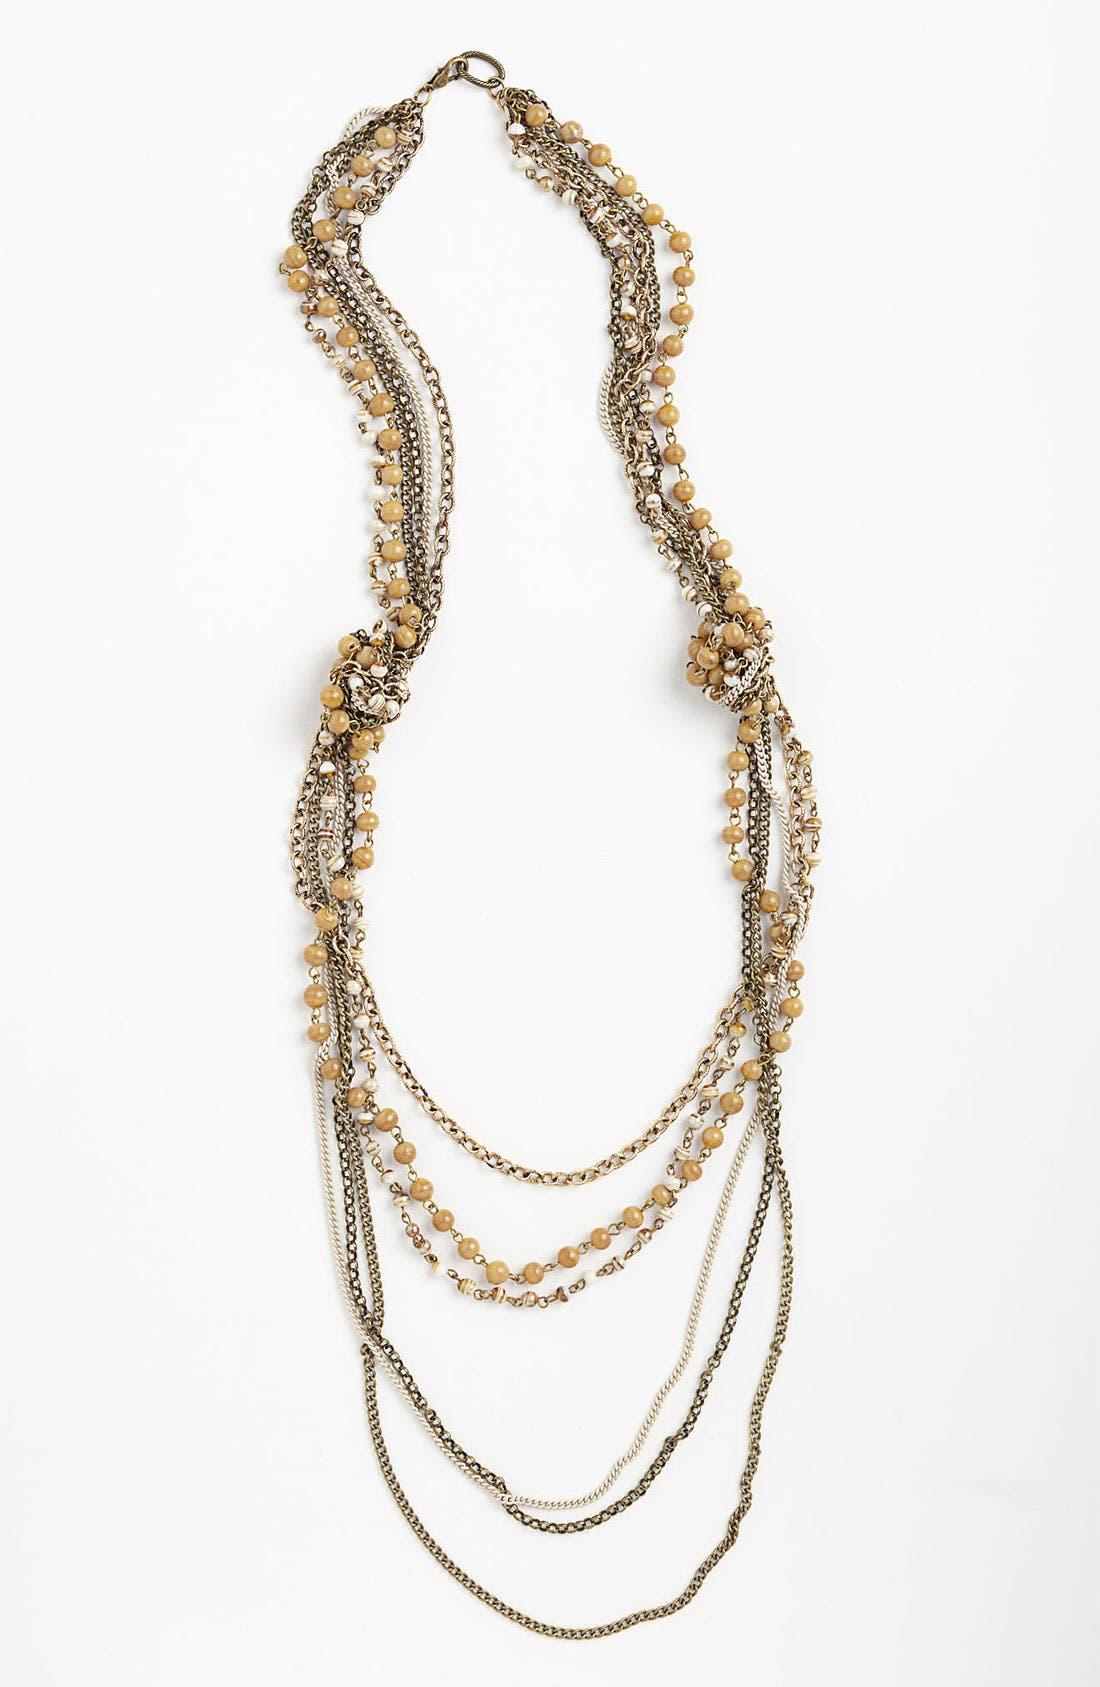 Main Image - Bonnie Jonas Multistrand Necklace